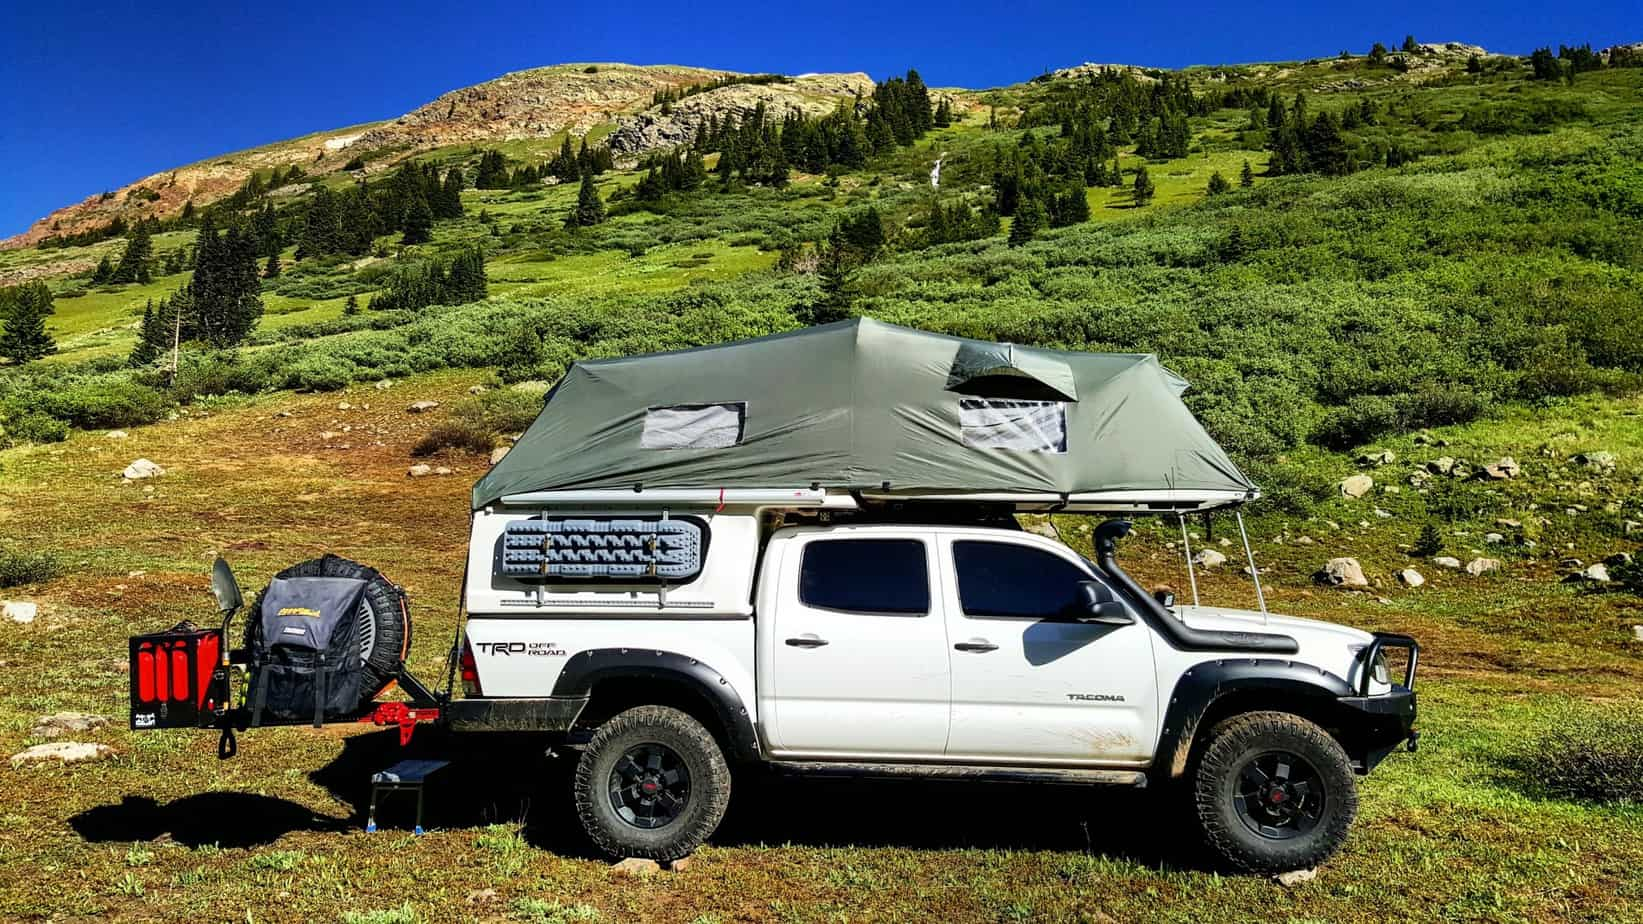 Off Road Van Parts >> Featured Vehicle: Jon Burtt's Toyota Tacoma – Expedition Portal